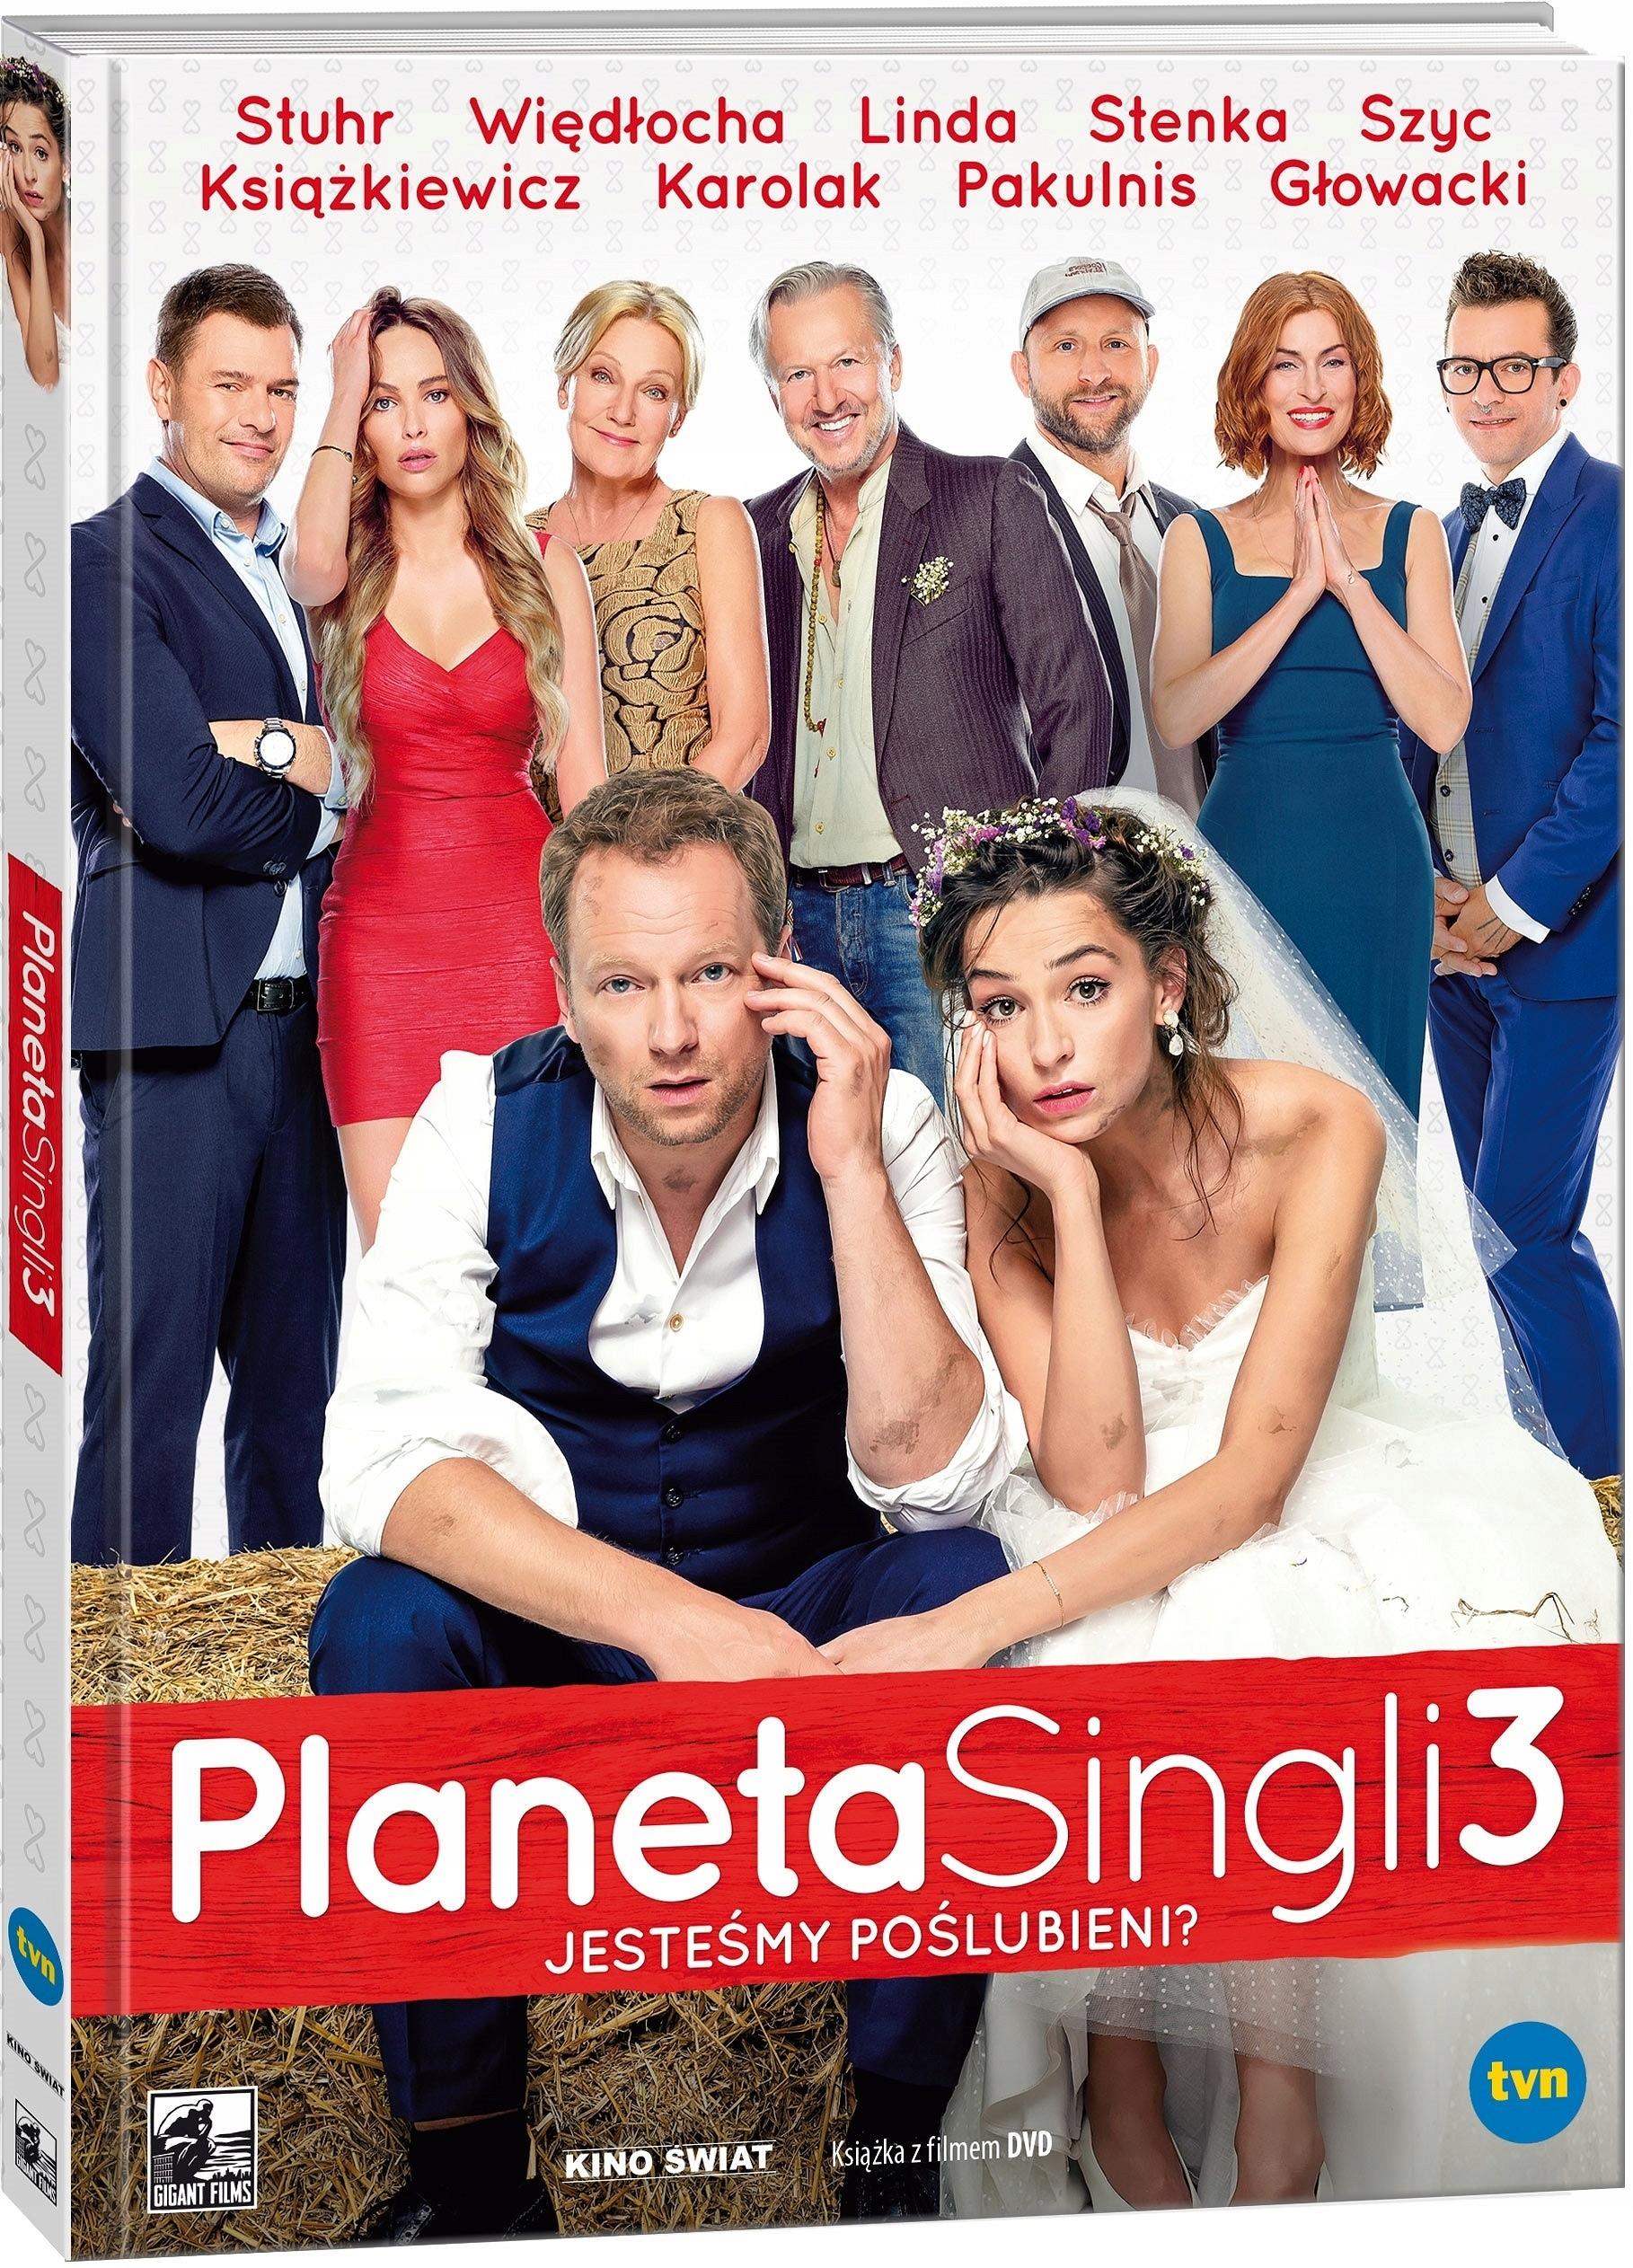 PLANETA SINGLI 3 [DVD]